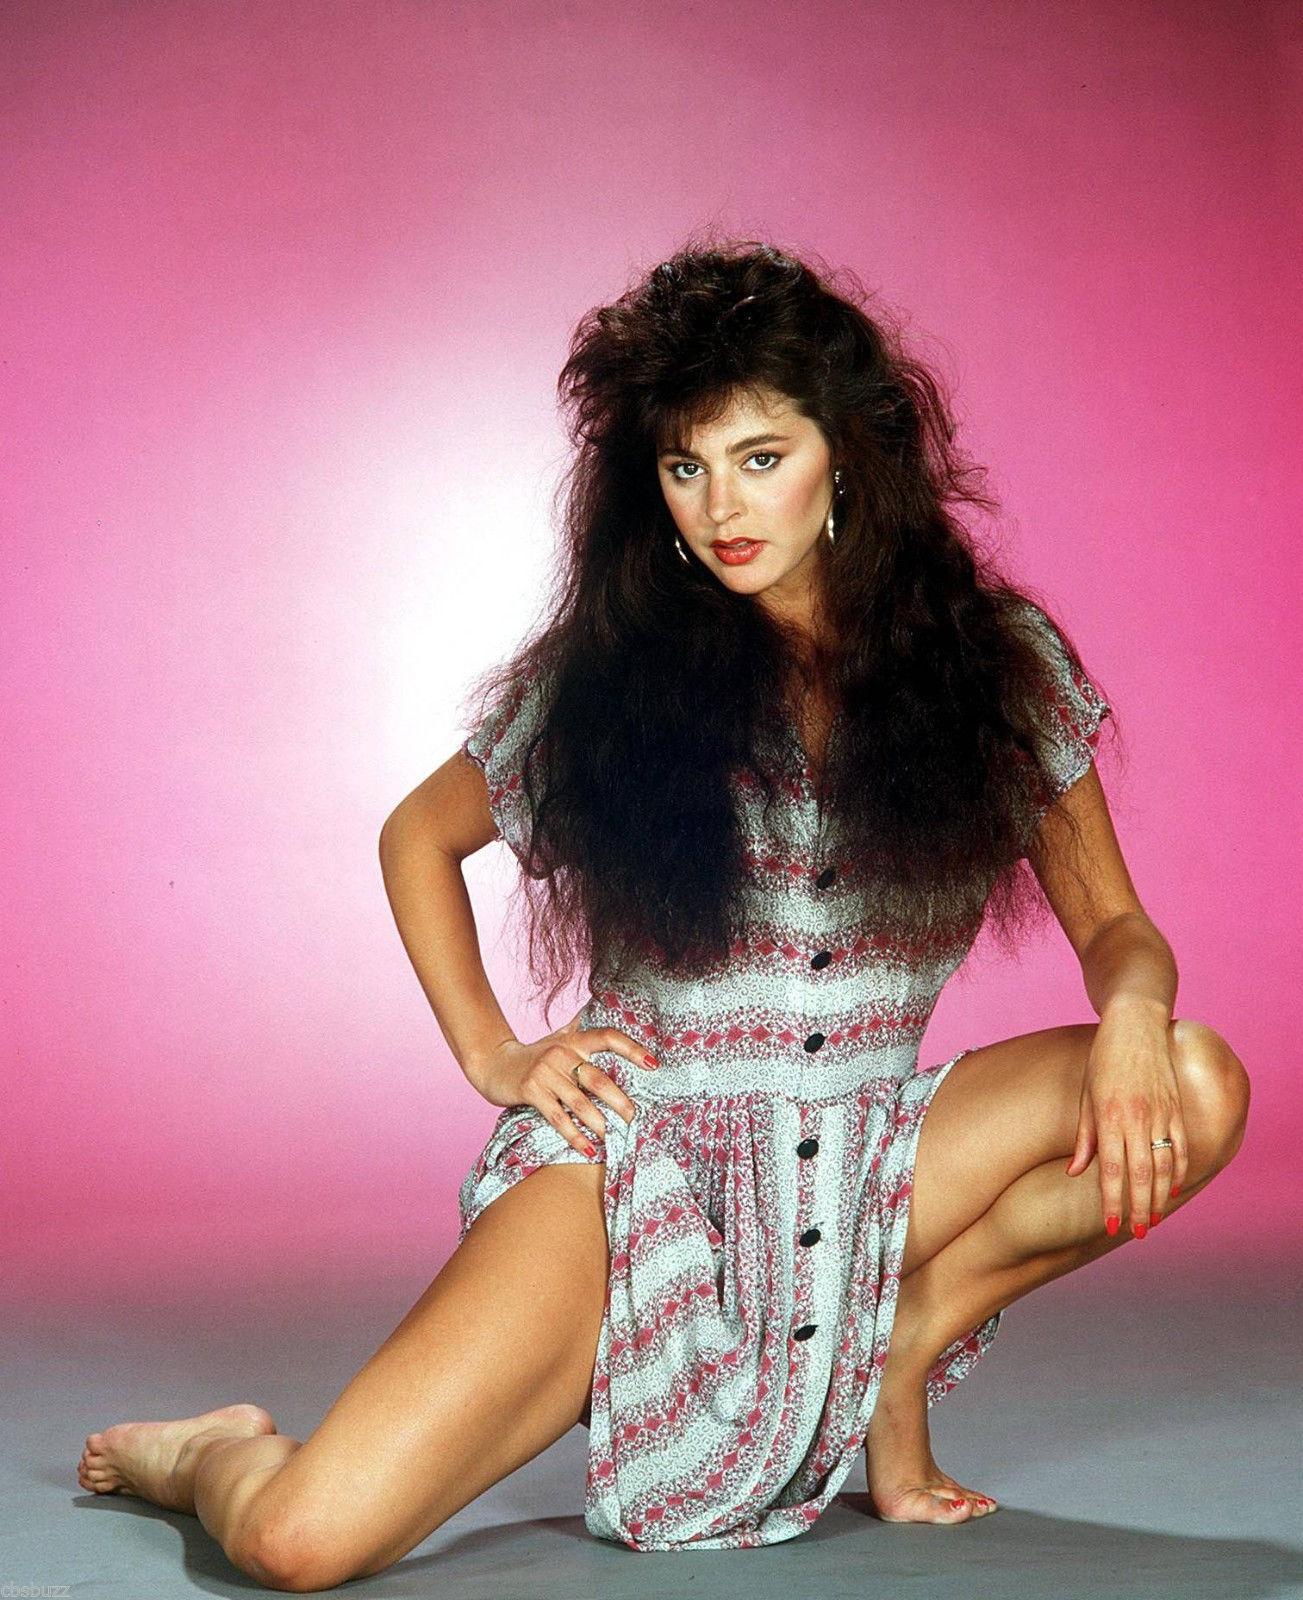 Hot Carlene Aguilar (b. 1982)  nudes (95 pics), Facebook, cleavage